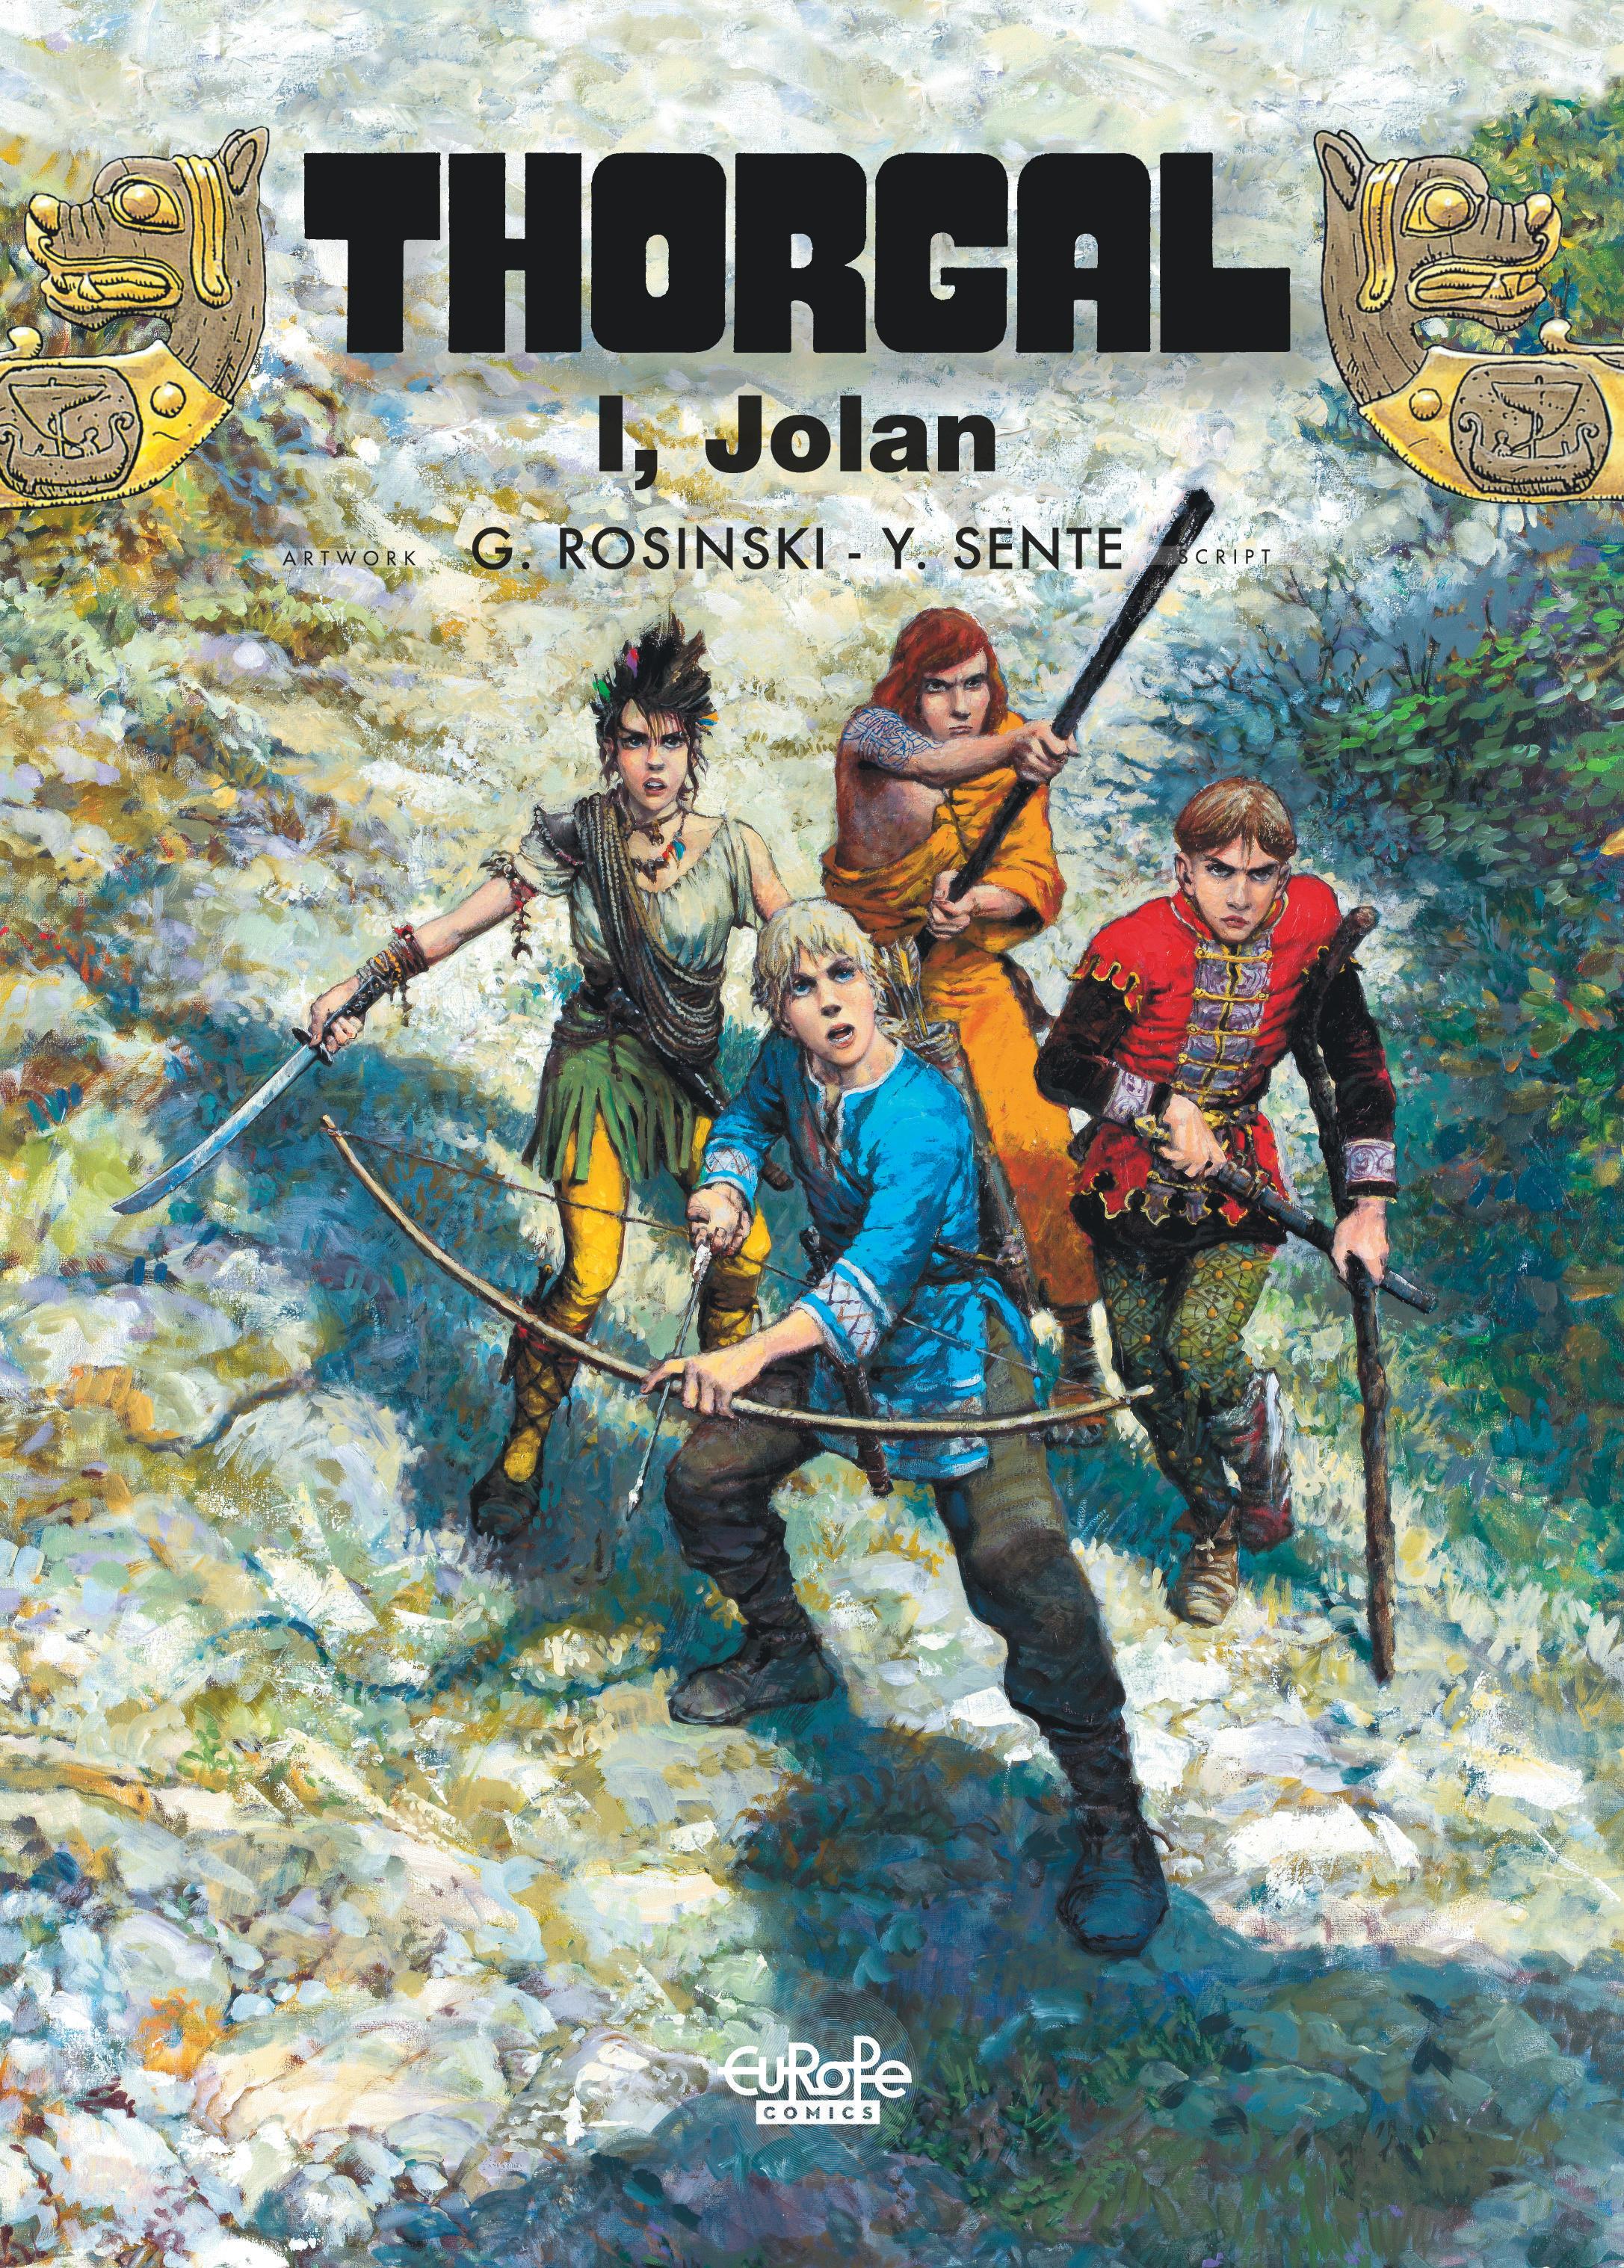 Thorgal - Volume 22 - I, Jolan